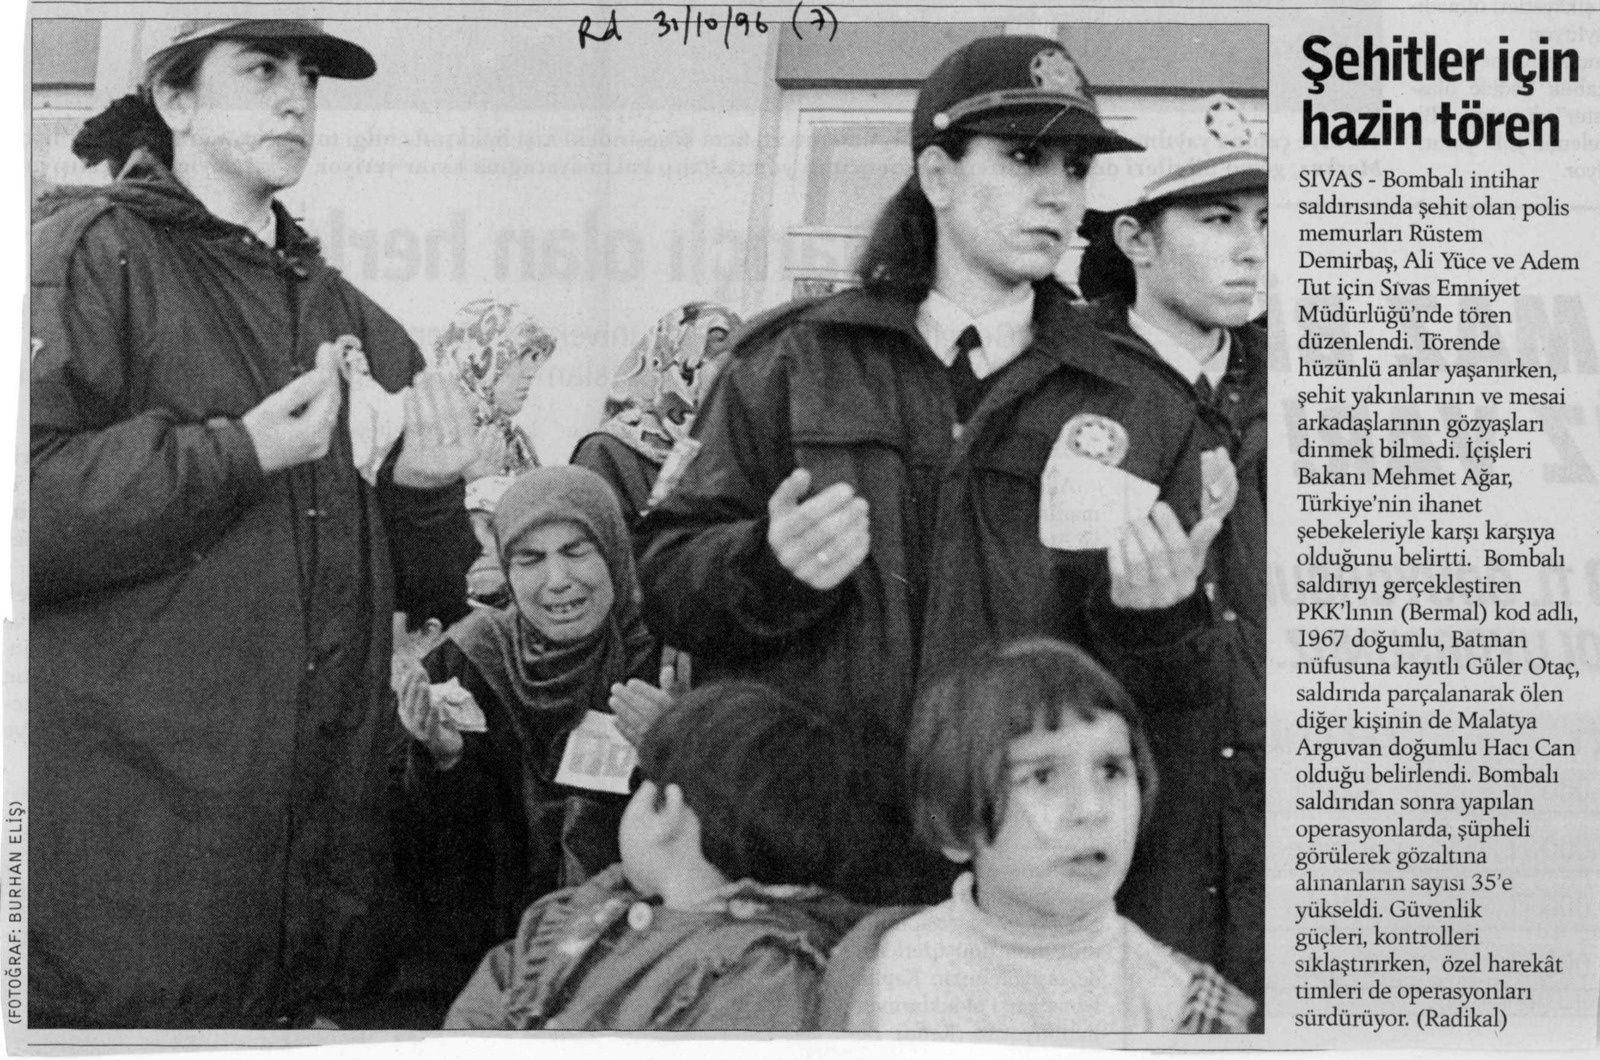 Obsèques d'un policier près de Sivas. Radikal, 31 octobre 1996. Cliché Burhan Elis